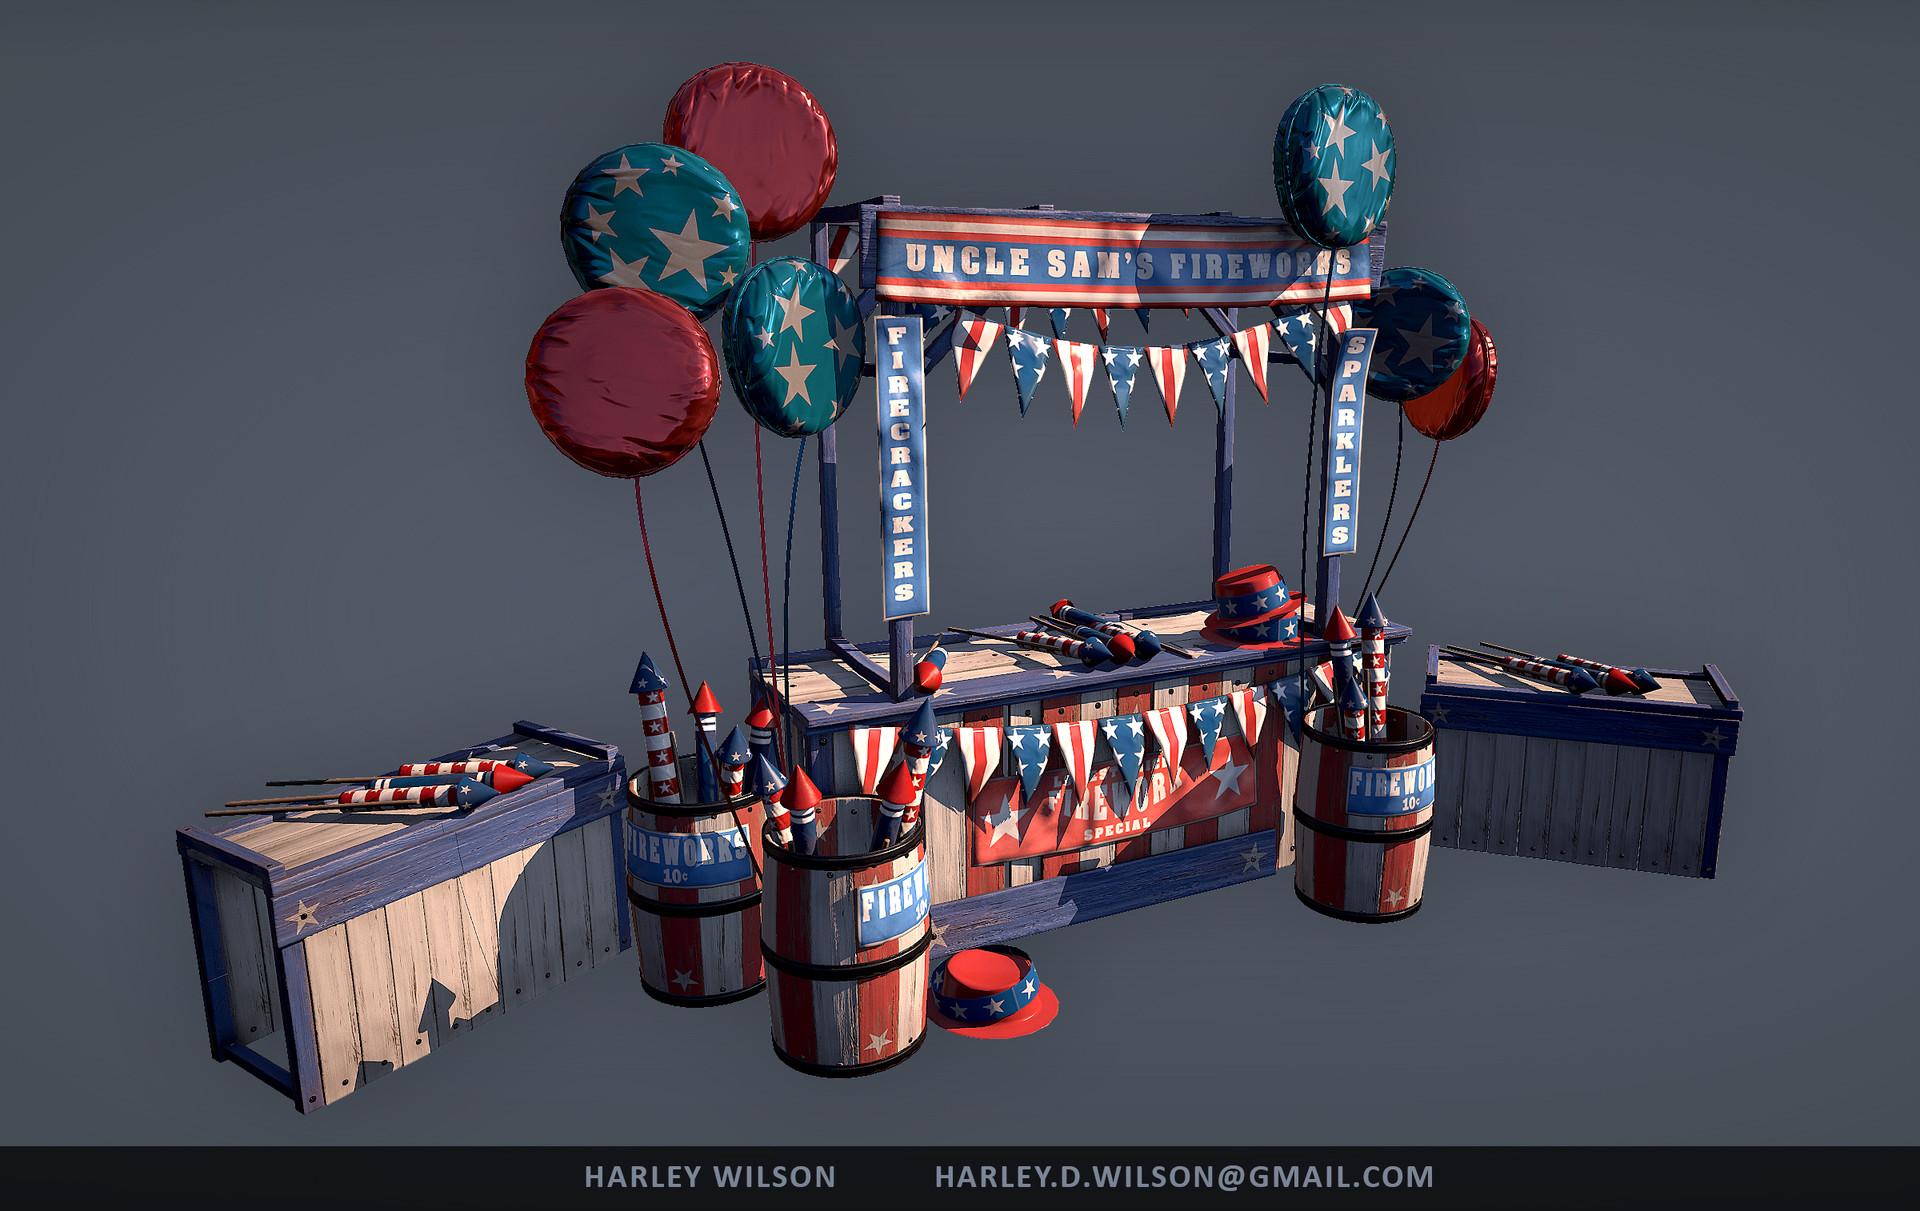 Harley wilson americana a